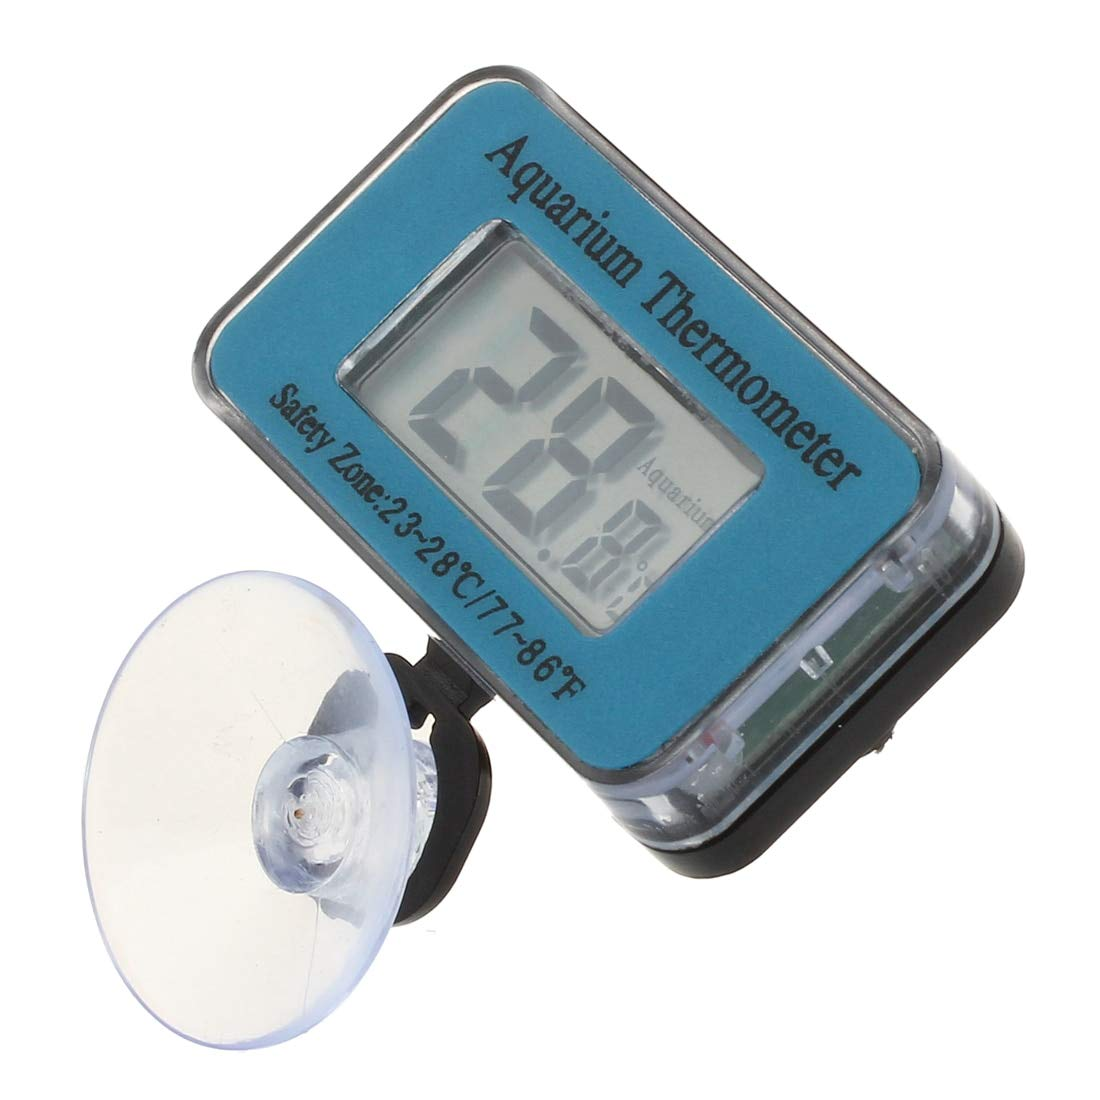 Ants-Store - Aquarium/Fish Tank Water Submersible Waterproof Digital LCD Thermometer